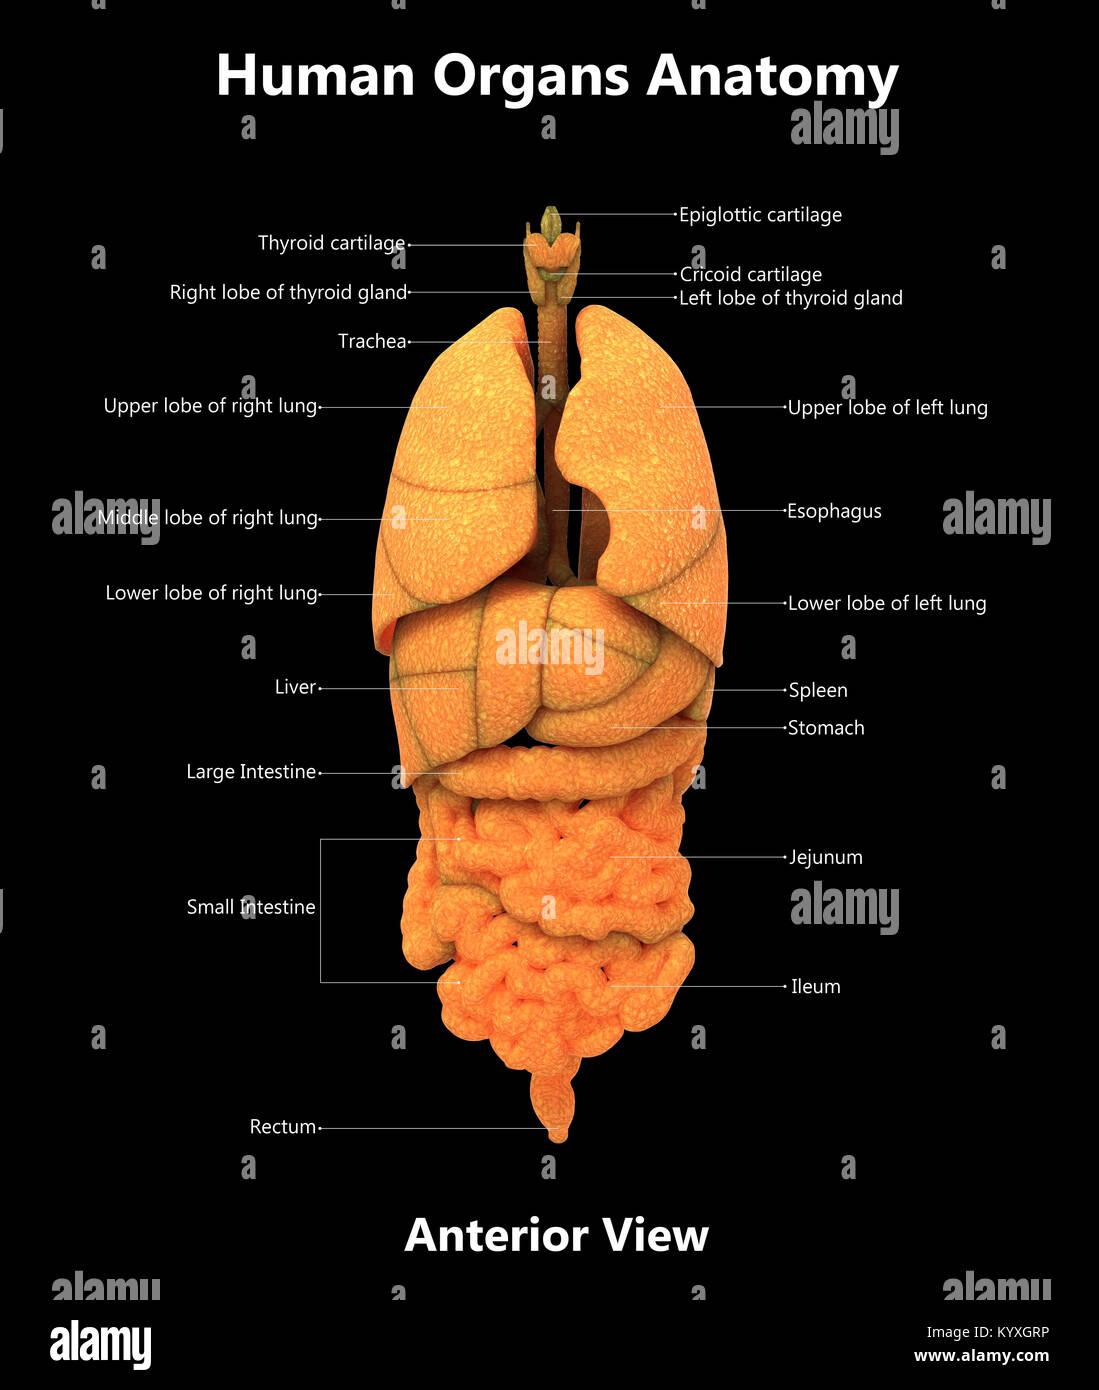 Heart Anterior View Imágenes De Stock & Heart Anterior View Fotos De ...